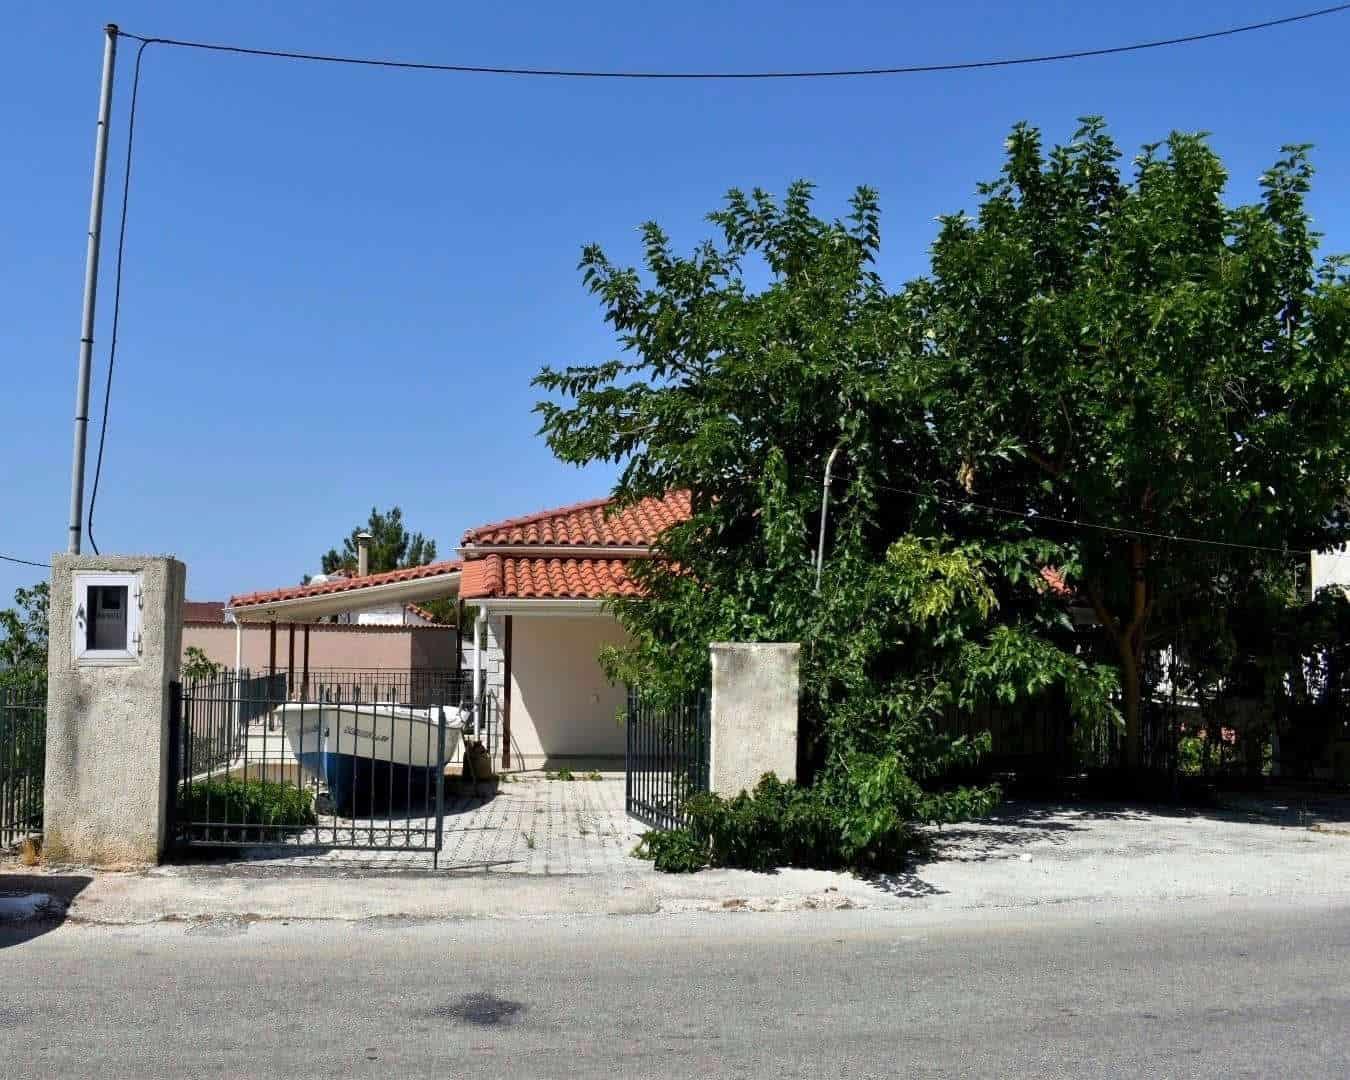 House for sale in Poriarata